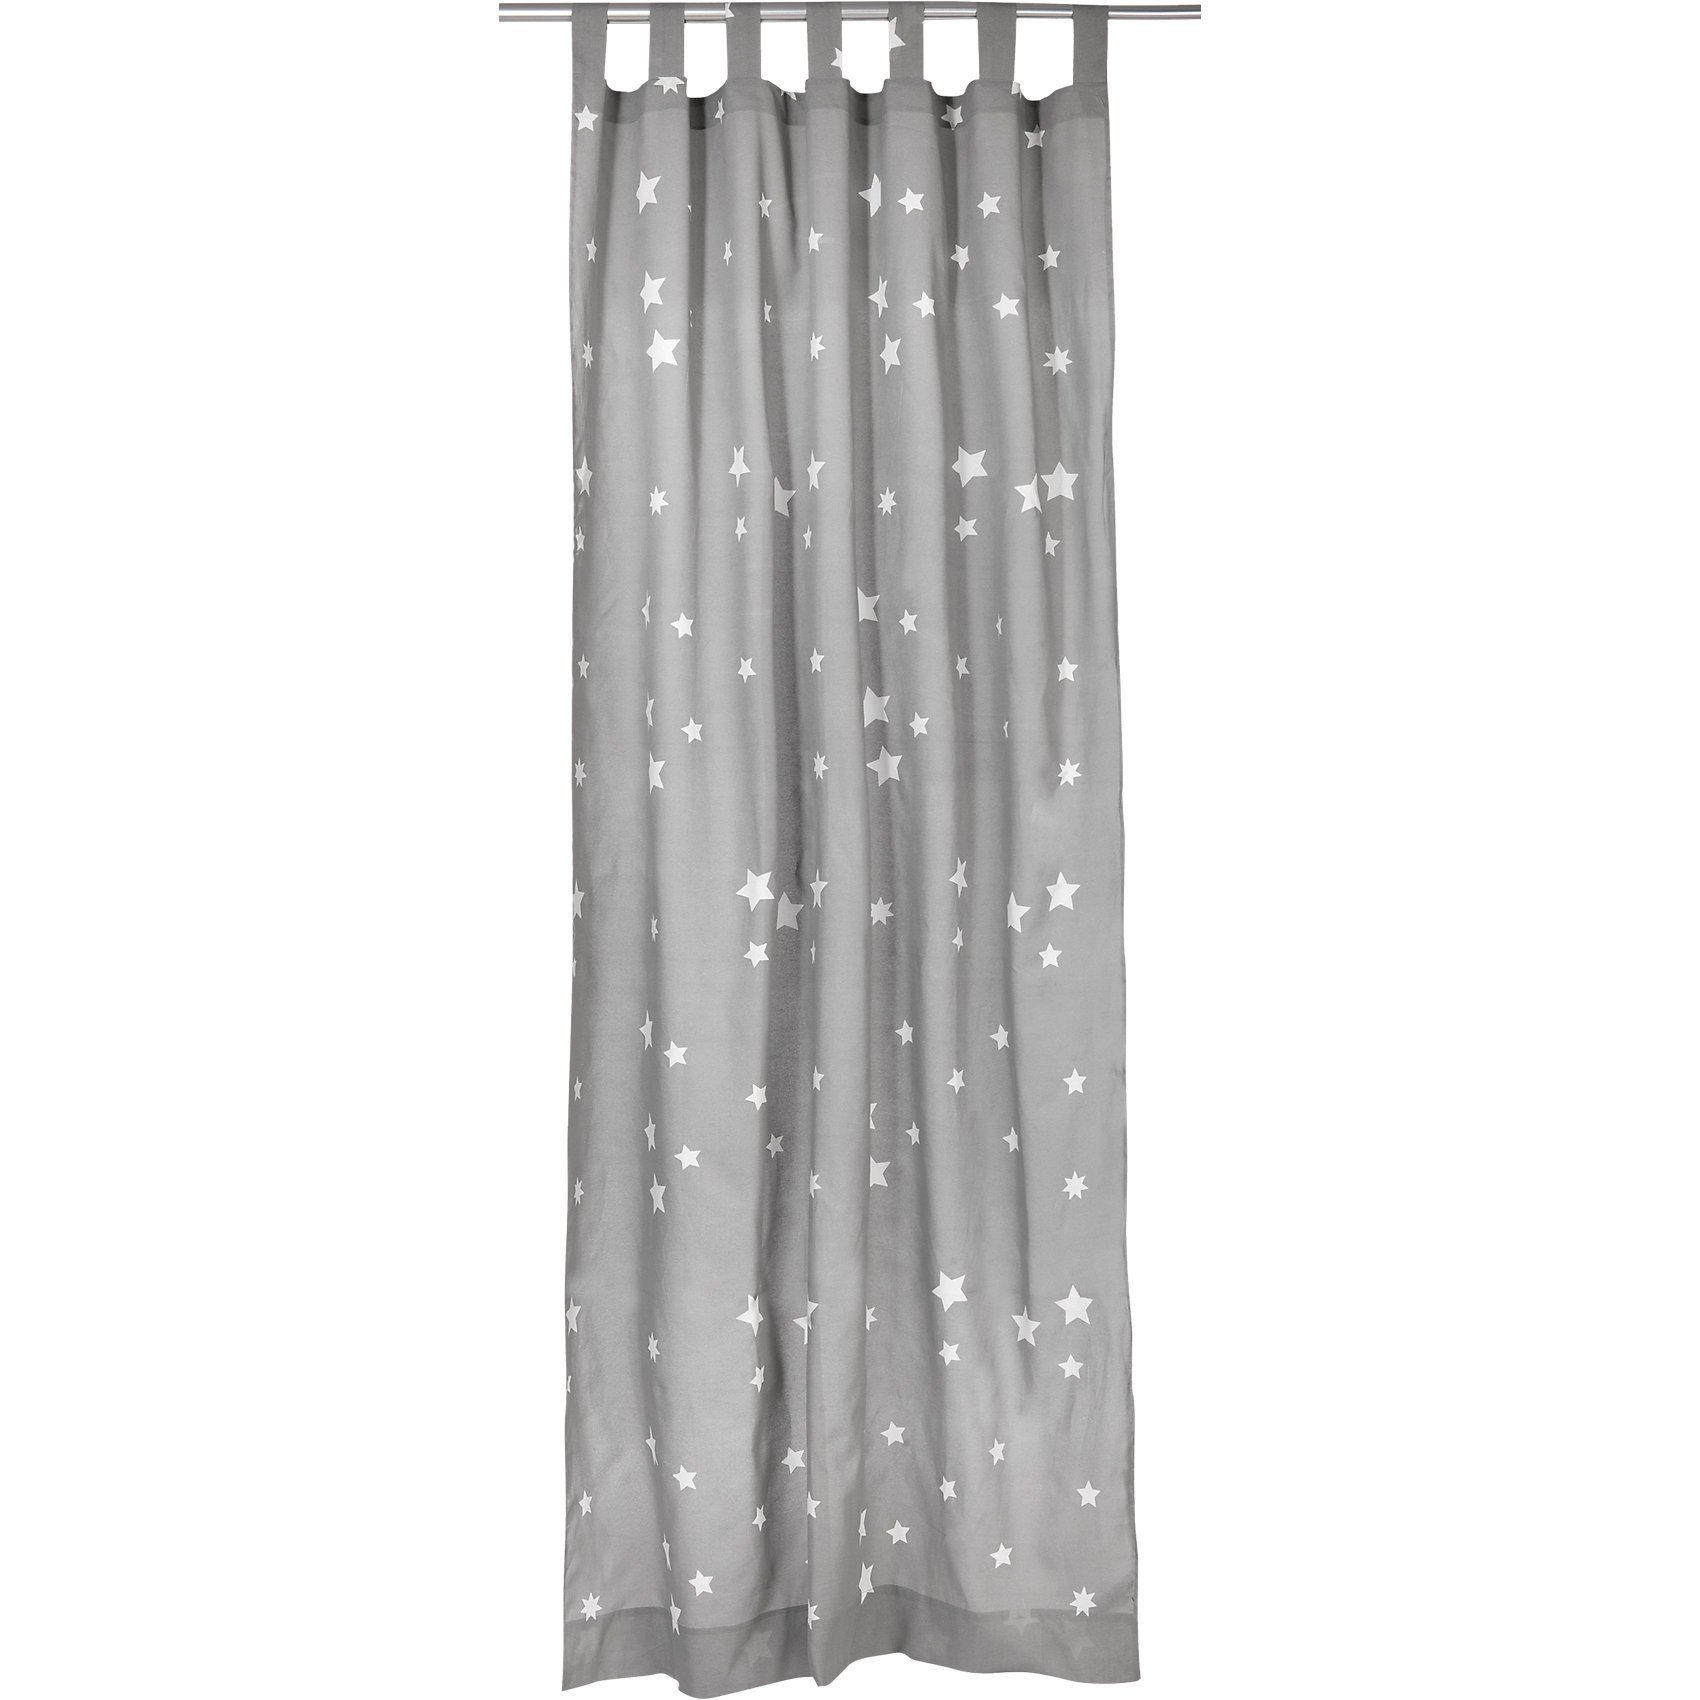 Vorhang Sterne inkl. Bügelband, grau-weiß, 140 x 245 cm (2 S